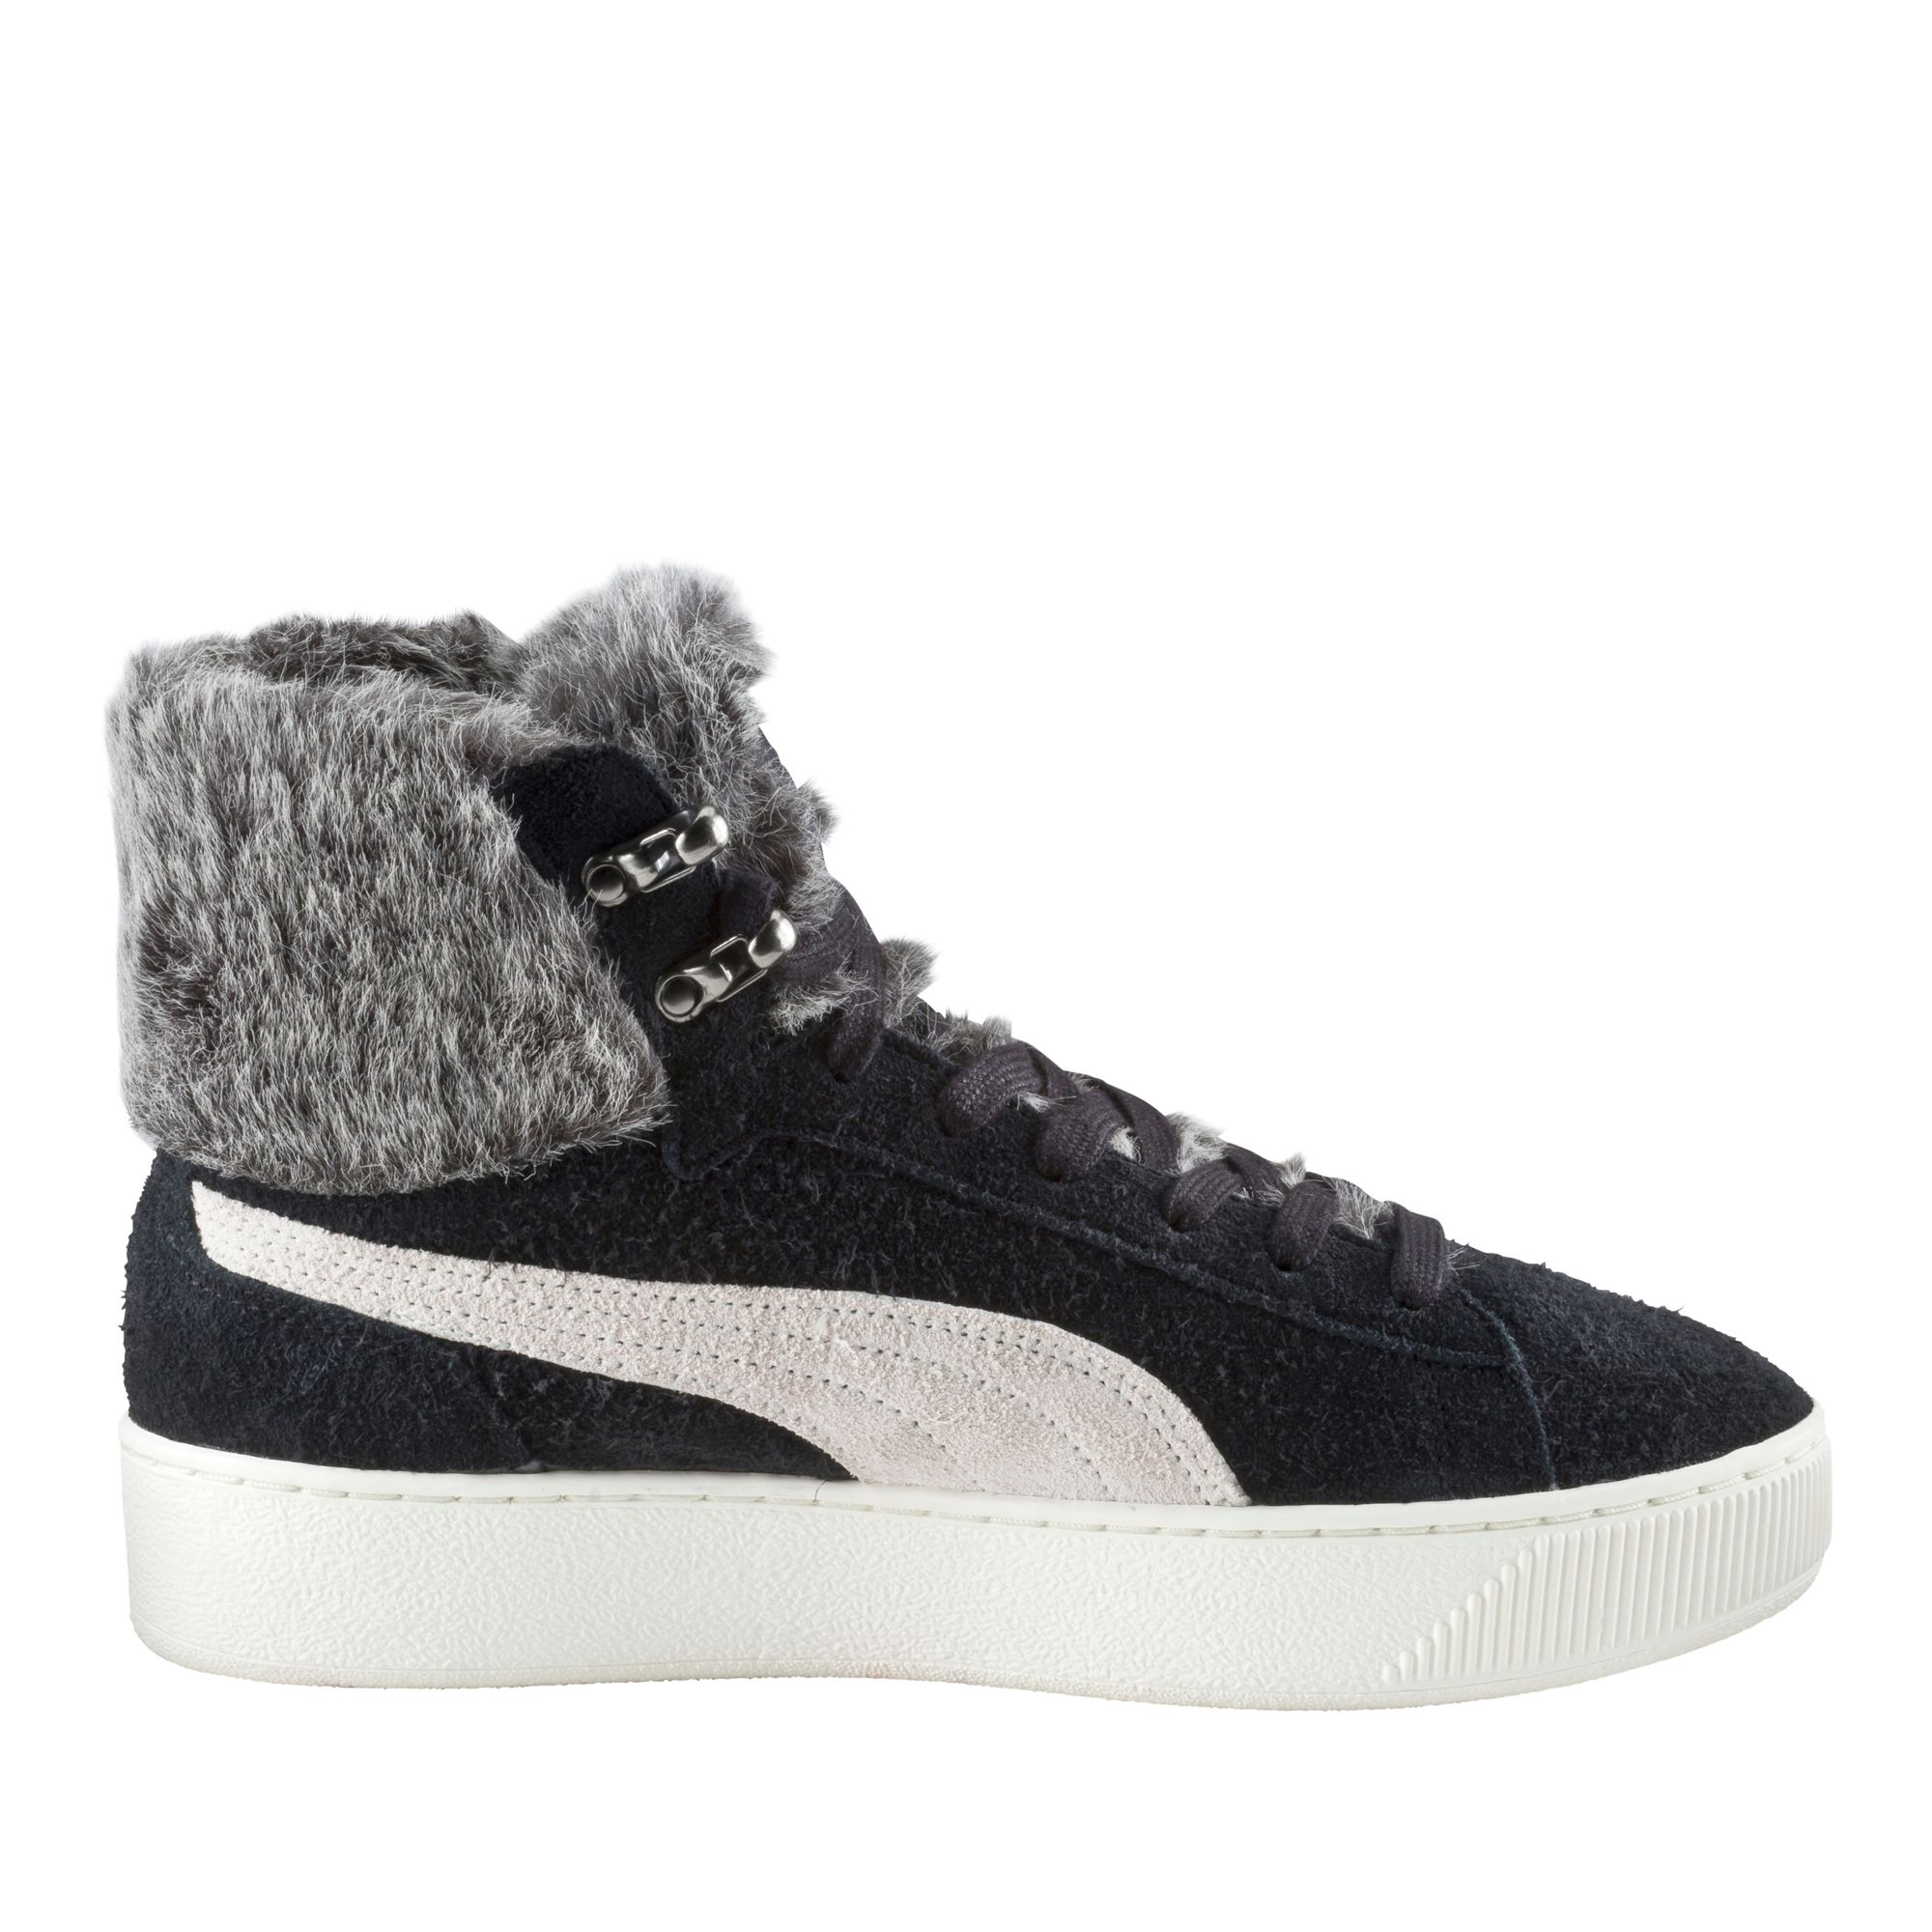 001e794d9793 PUMA PC Extreme Hiker Wn s carafe Footwear Winter Shoes Modern Sport ...